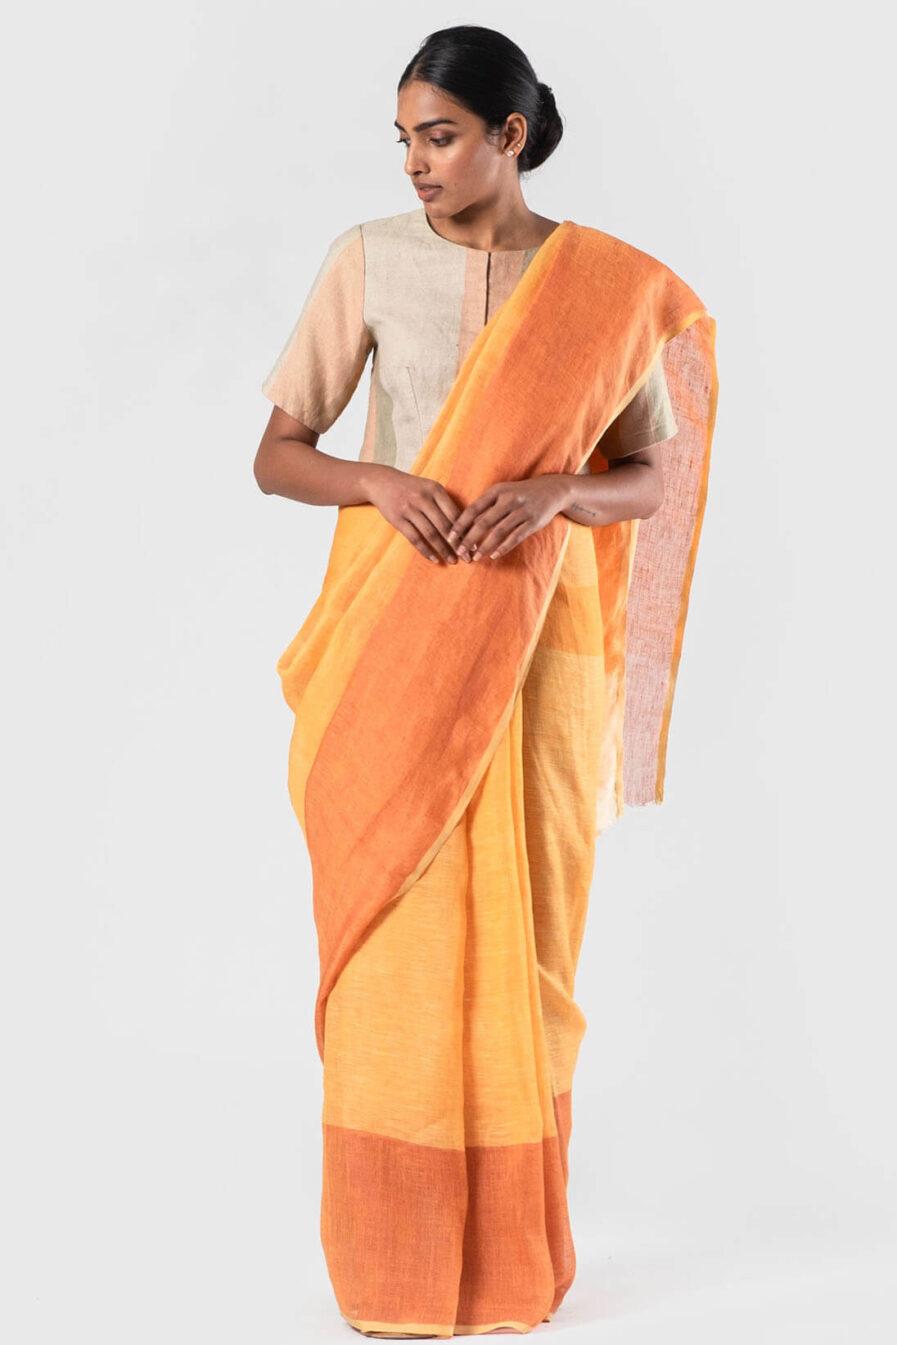 Aanvila Tan and tangerine linen sari